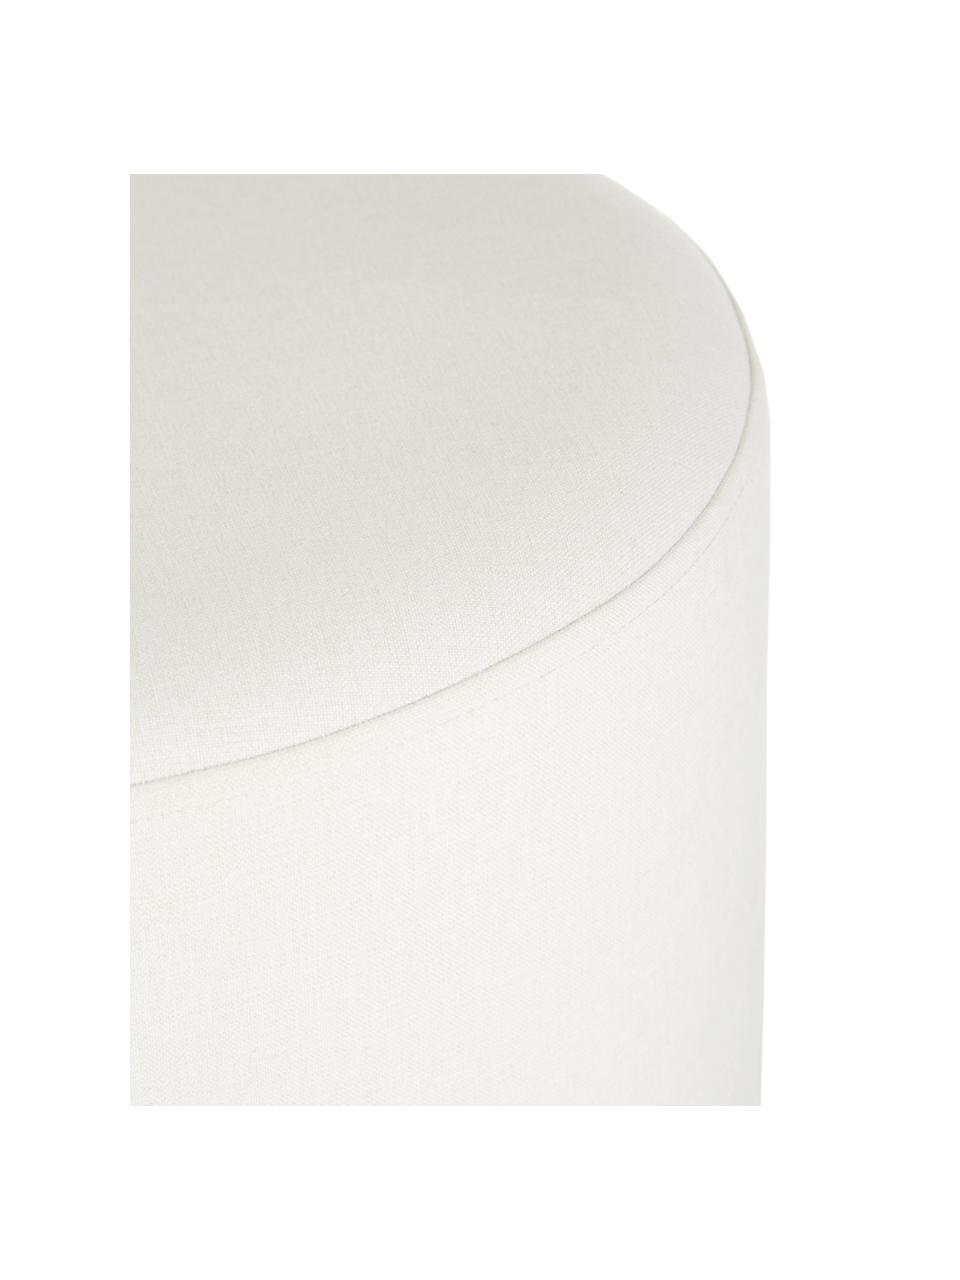 Pouf bianco crema Daisy, Rivestimento: 100% poliestere Il rivest, Struttura: compensato, Bianco, Ø 38 x Alt. 45 cm